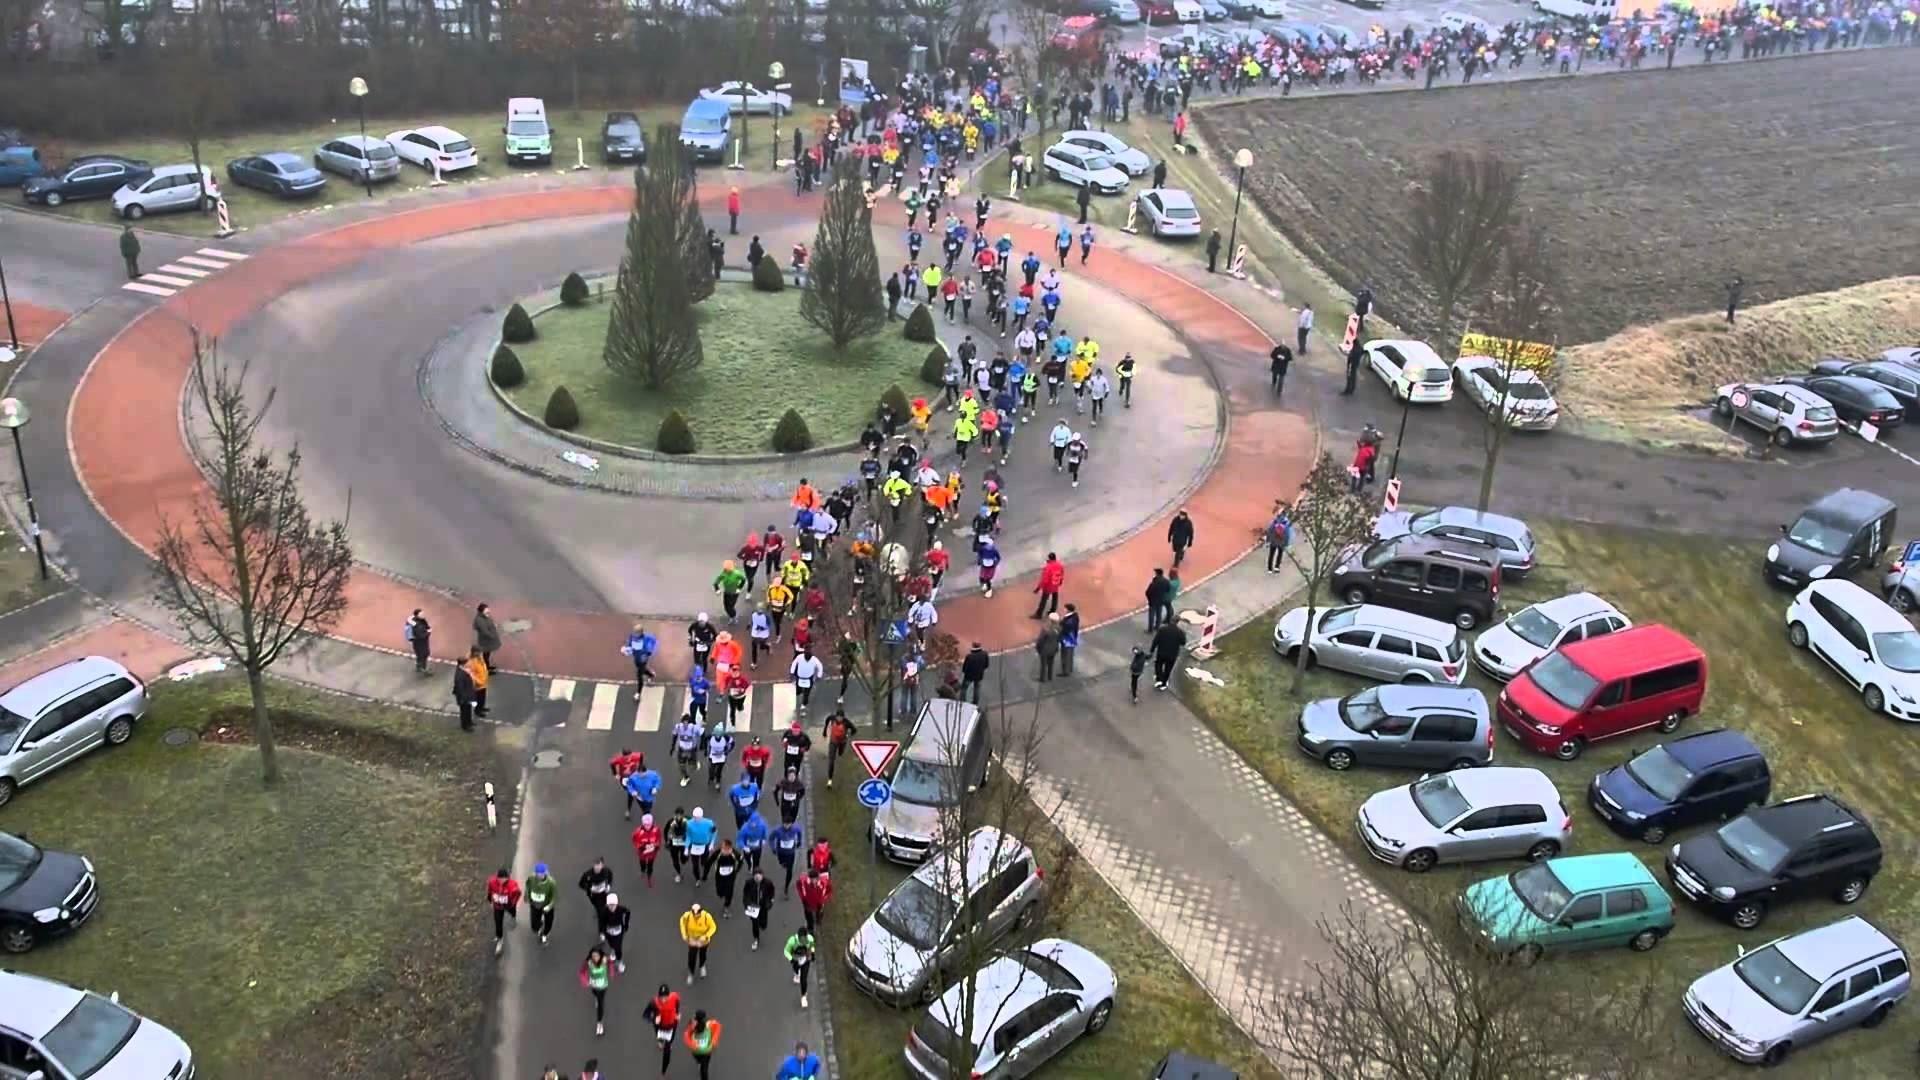 johannesbad thermen marathon